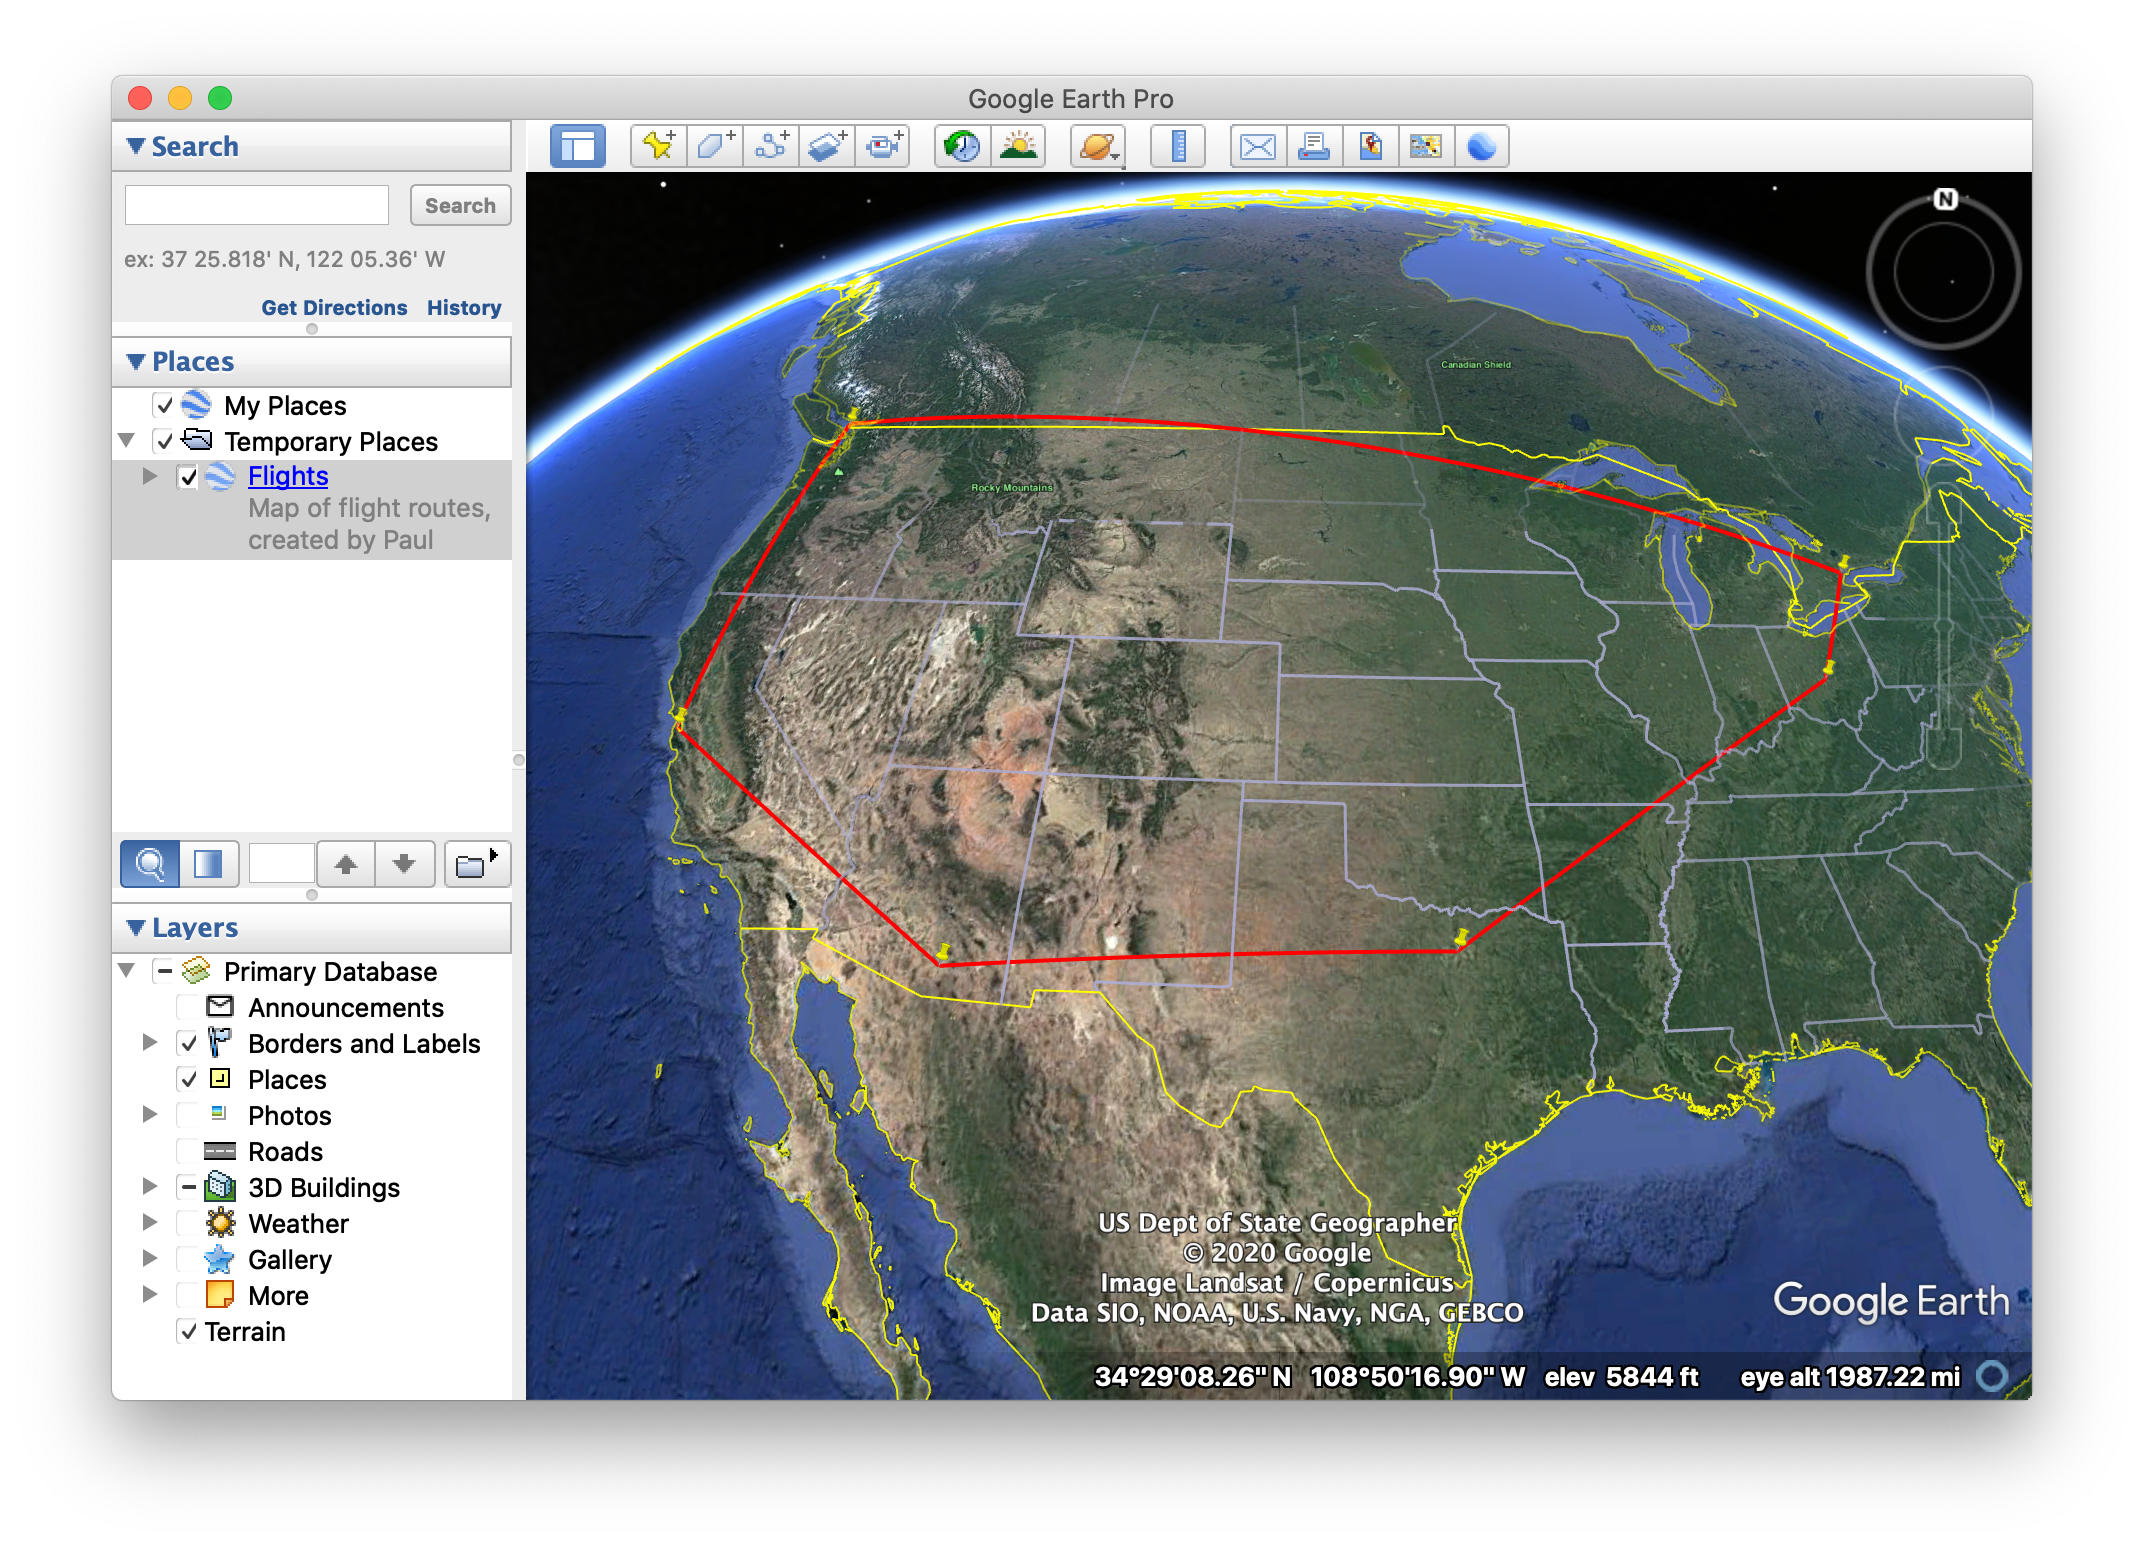 Google Earth, showing a trip from CMH-DFW-TUS-SFO-YVR-YYZ-CMH.